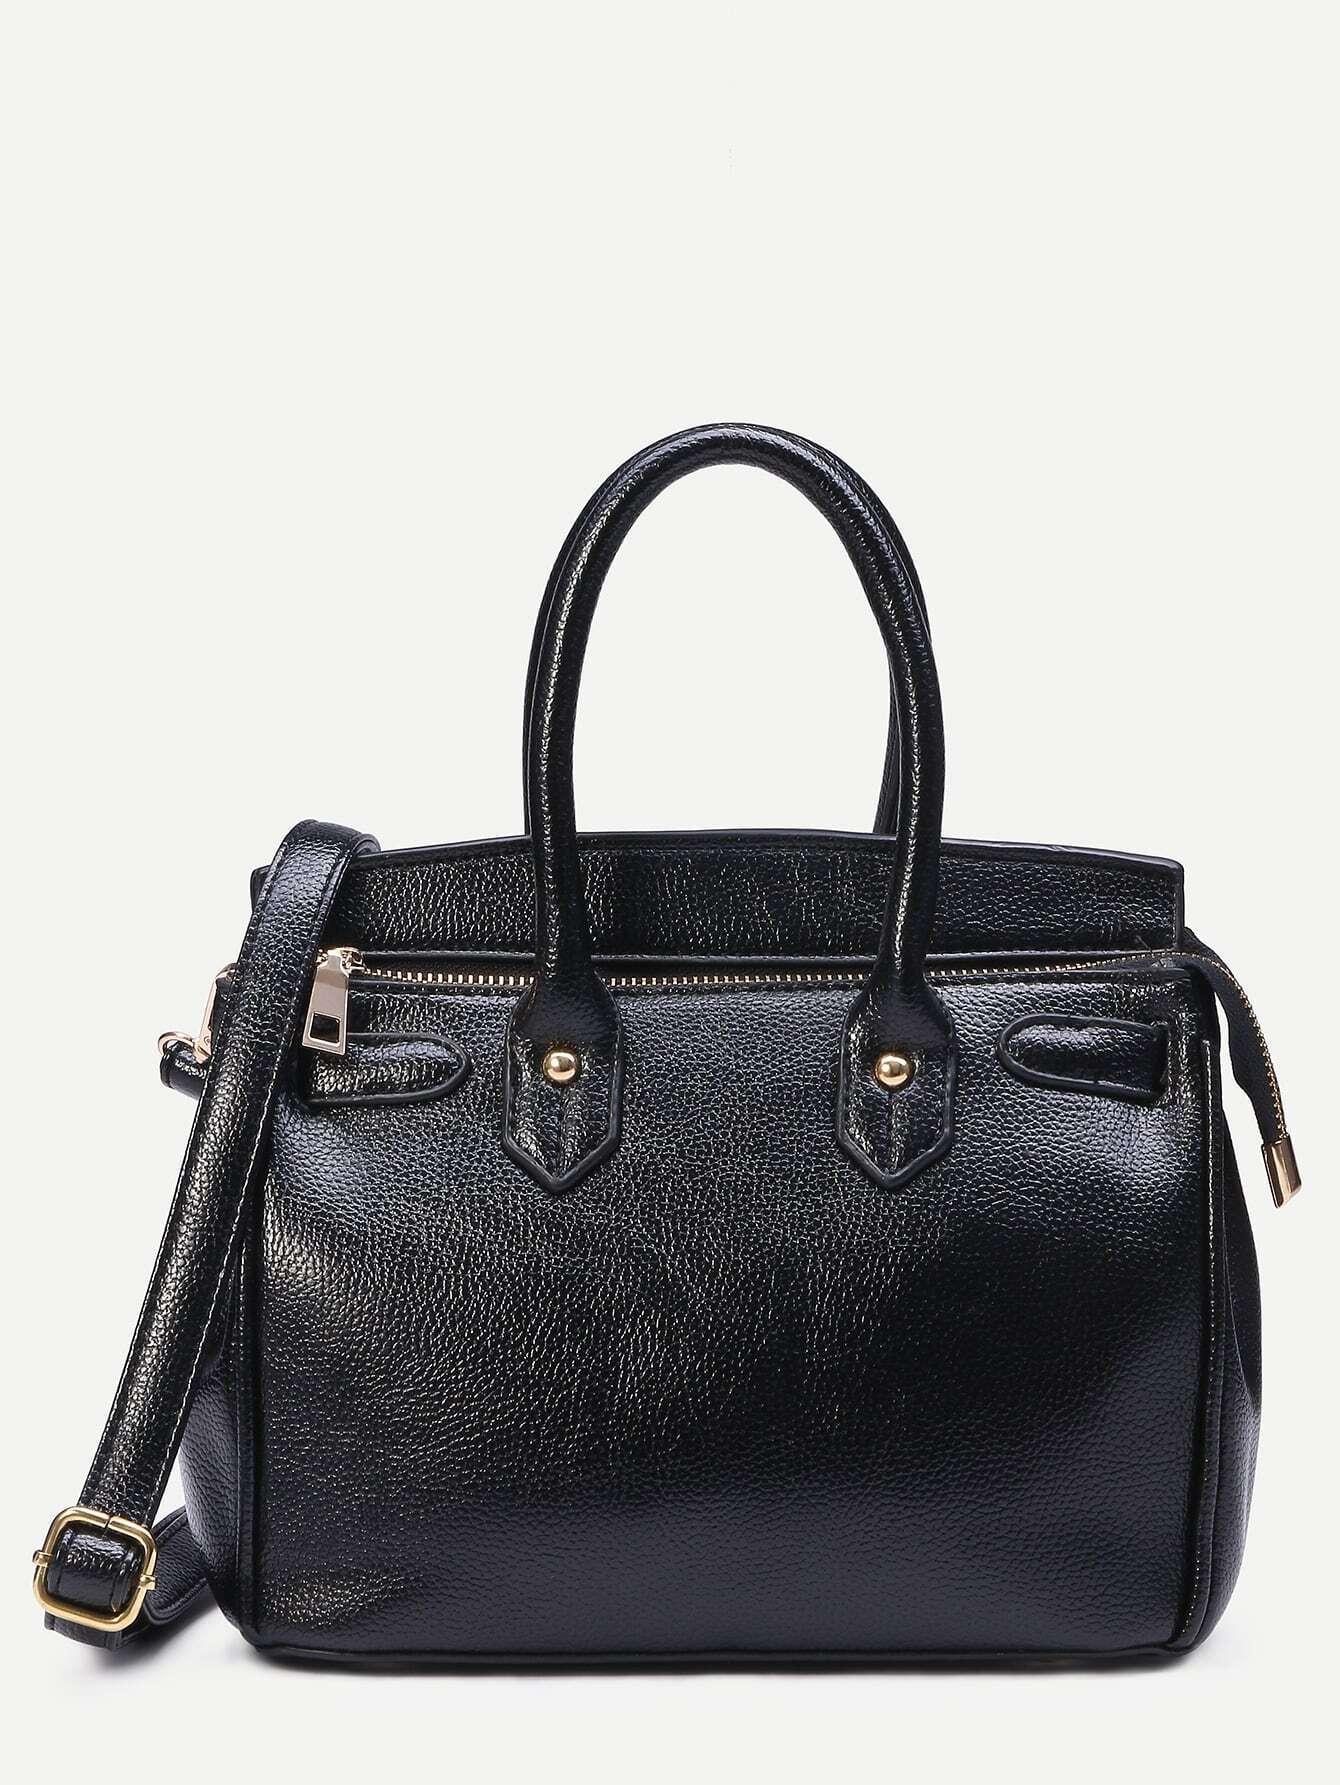 bag160808301_2